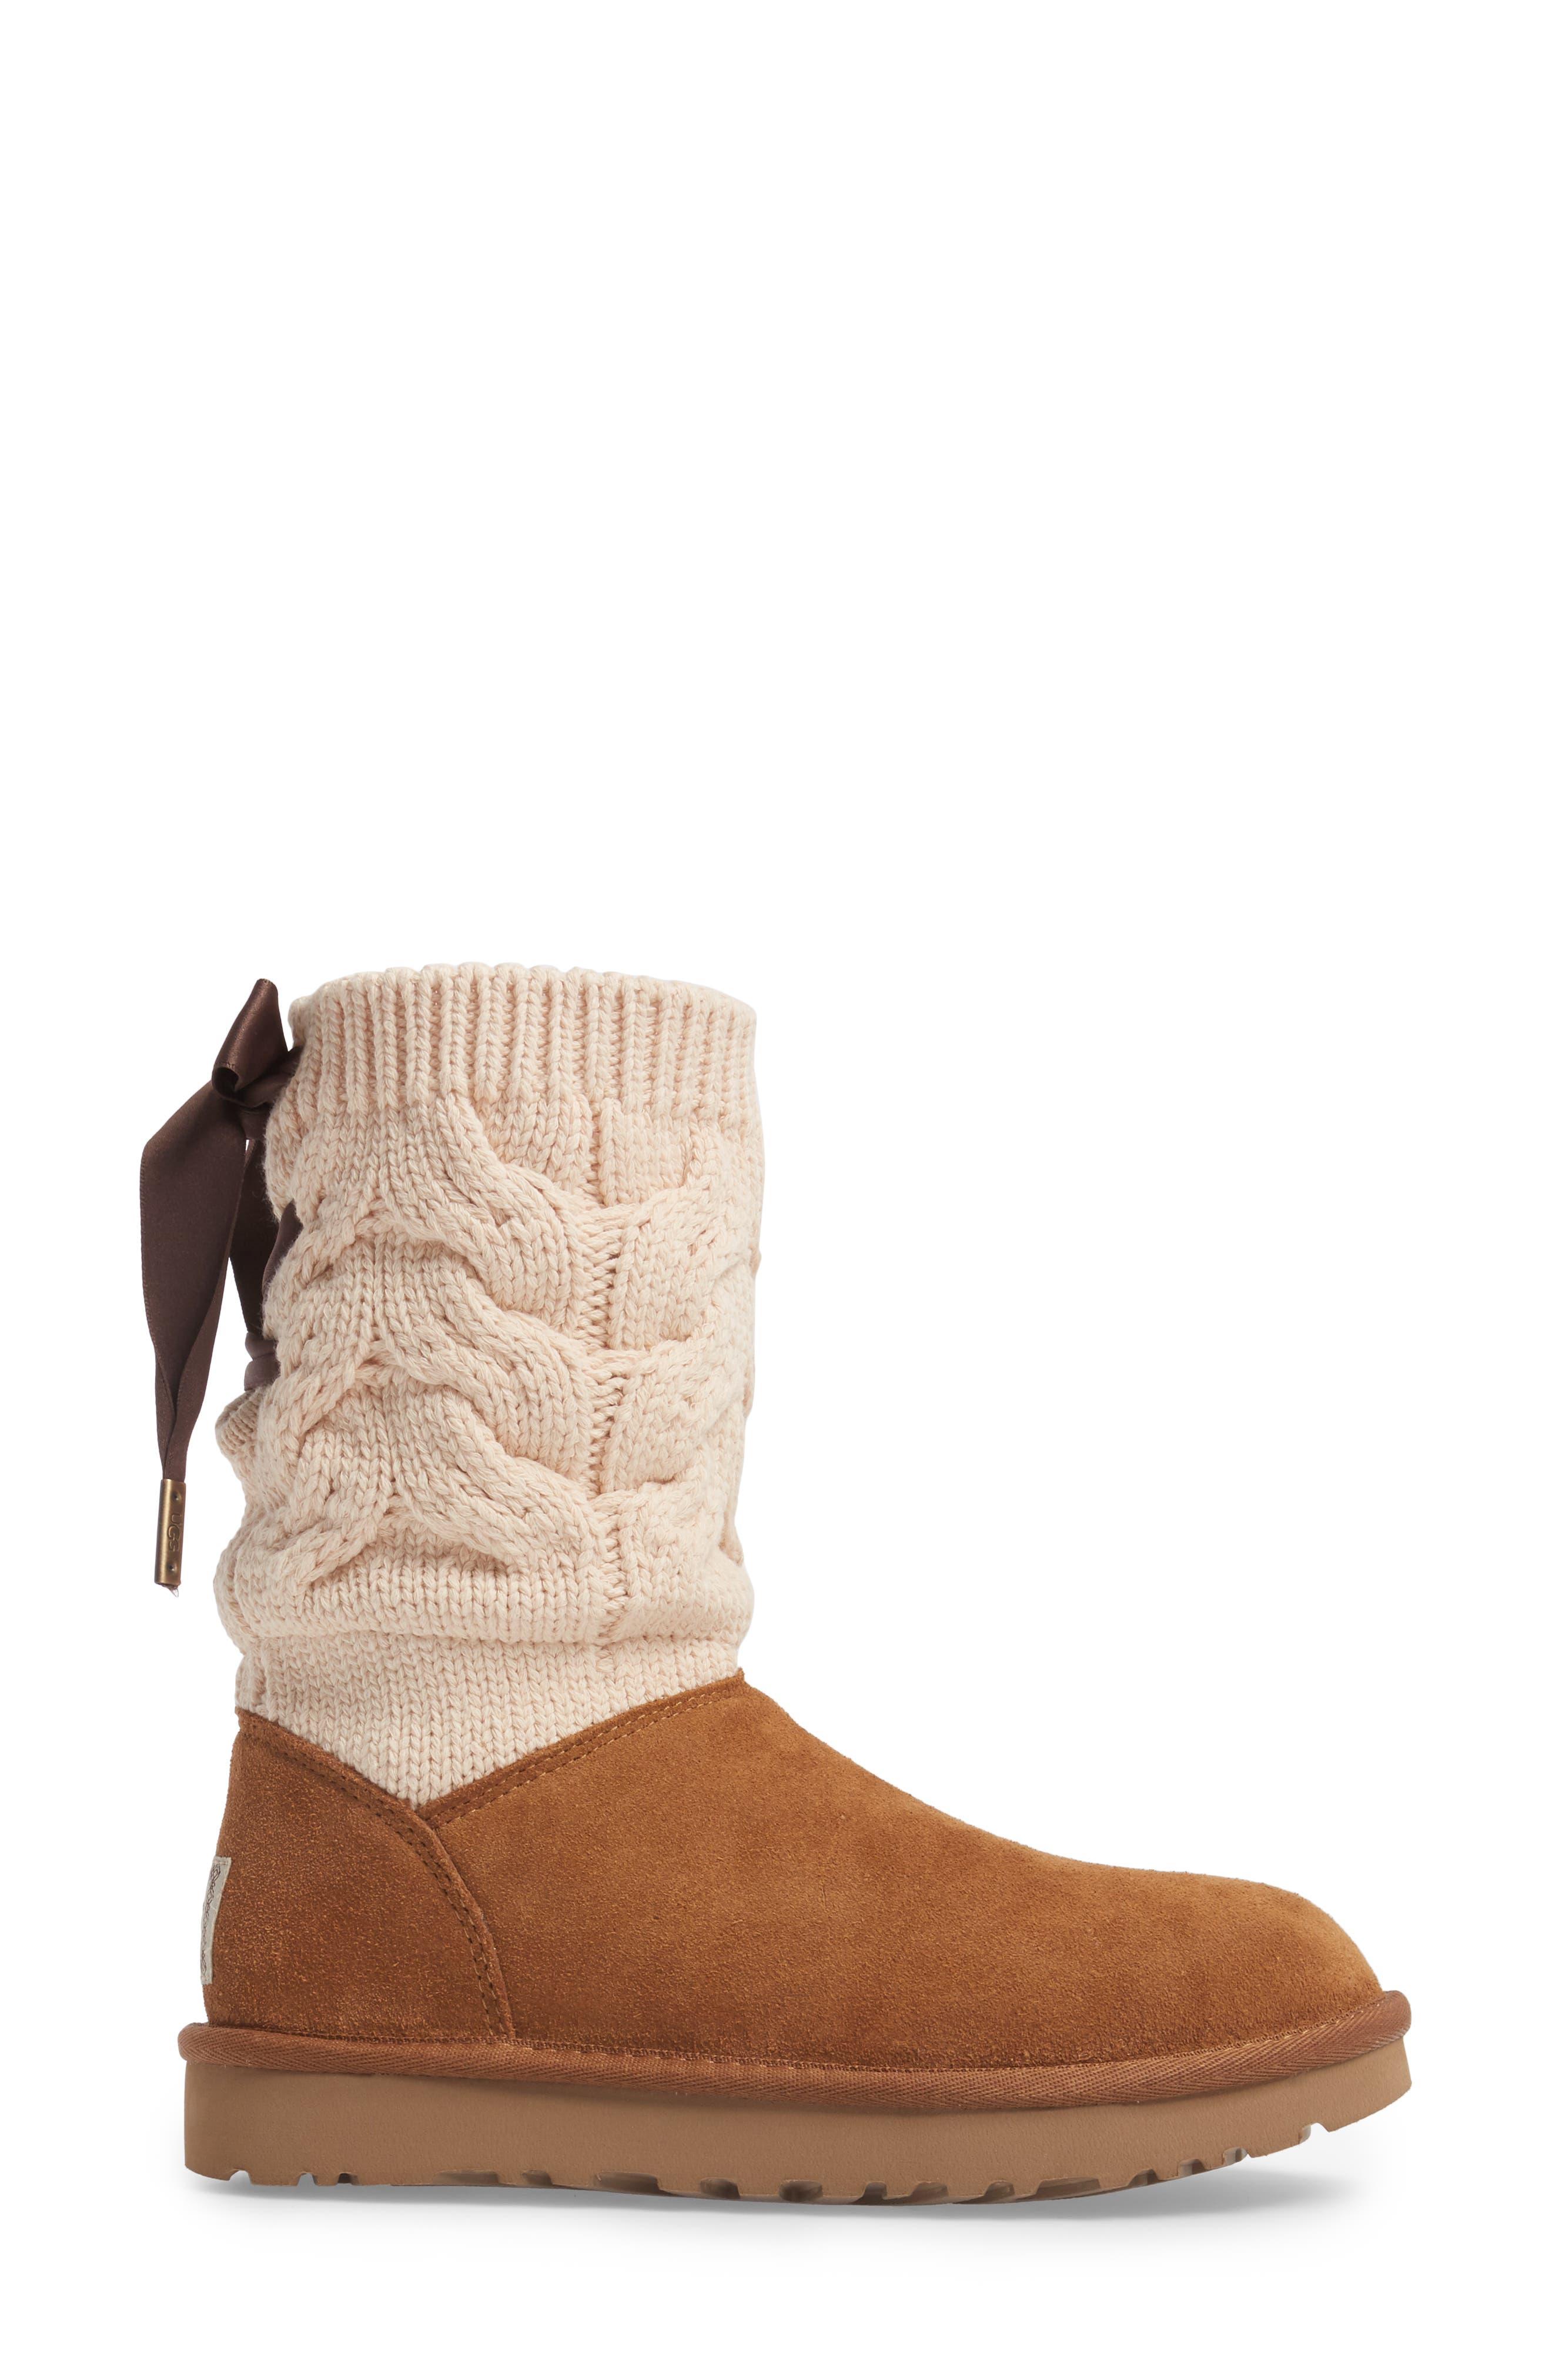 Kiandra Boot,                             Alternate thumbnail 3, color,                             Chestnut Suede